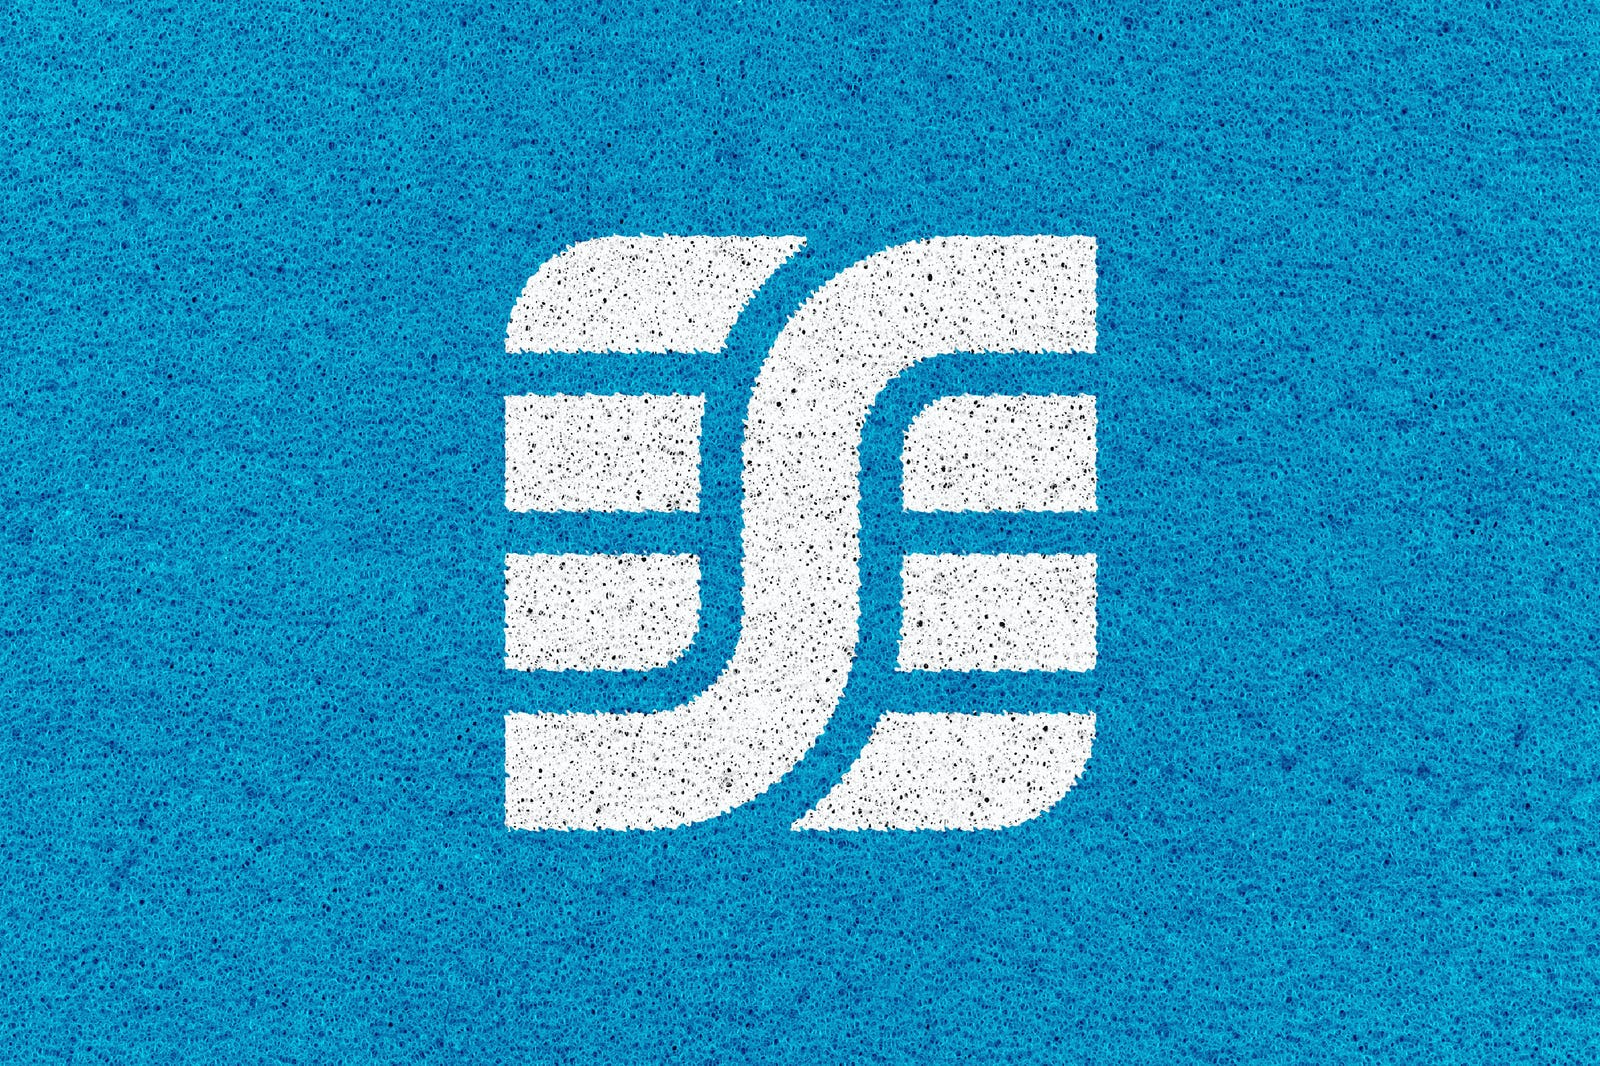 Stobitan track logo mark